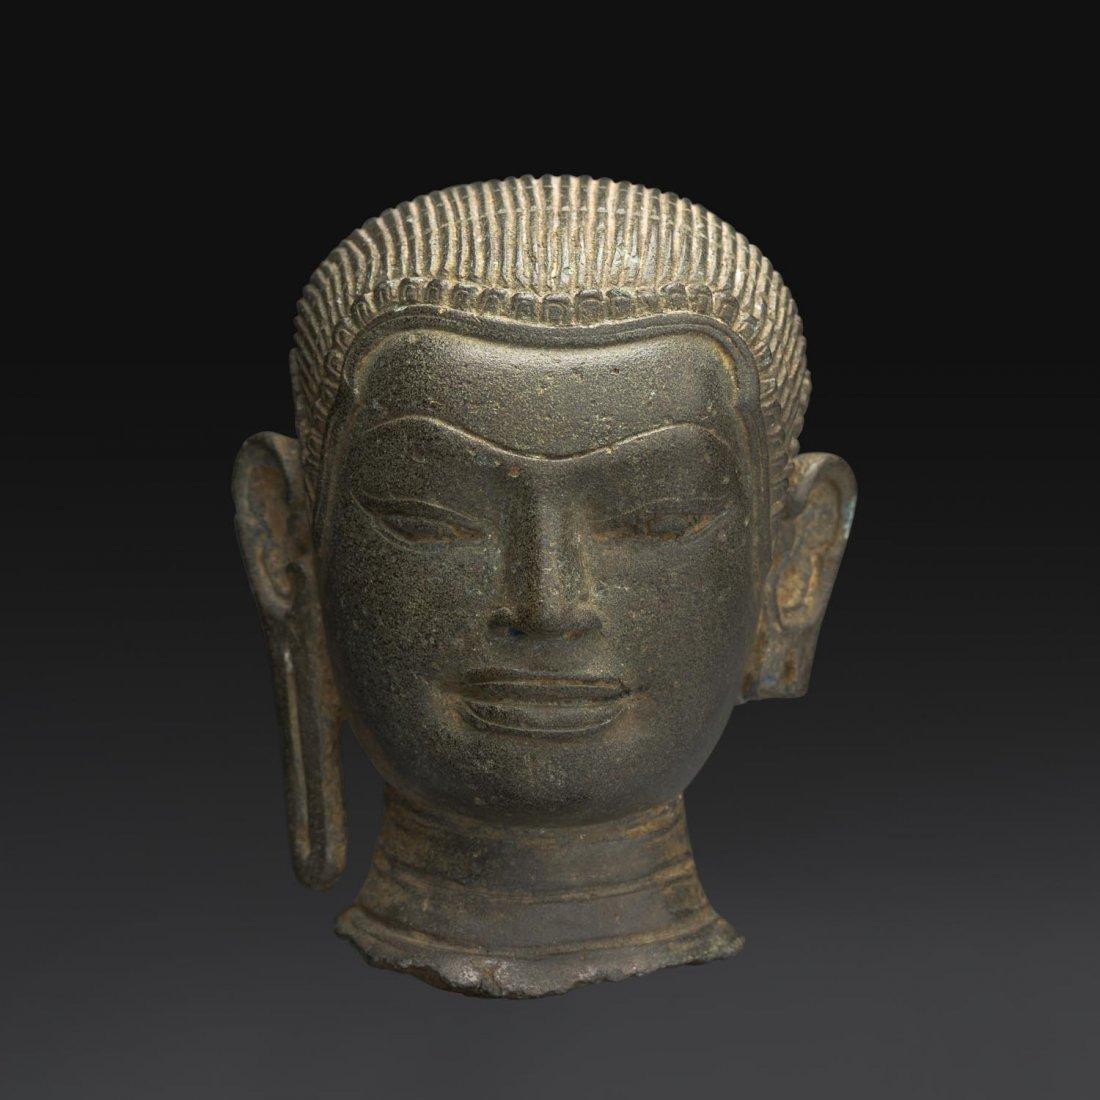 A SMALL KHMER BRONZE HEAD OF BUDDHA, ANGKOR WAT, BAYON